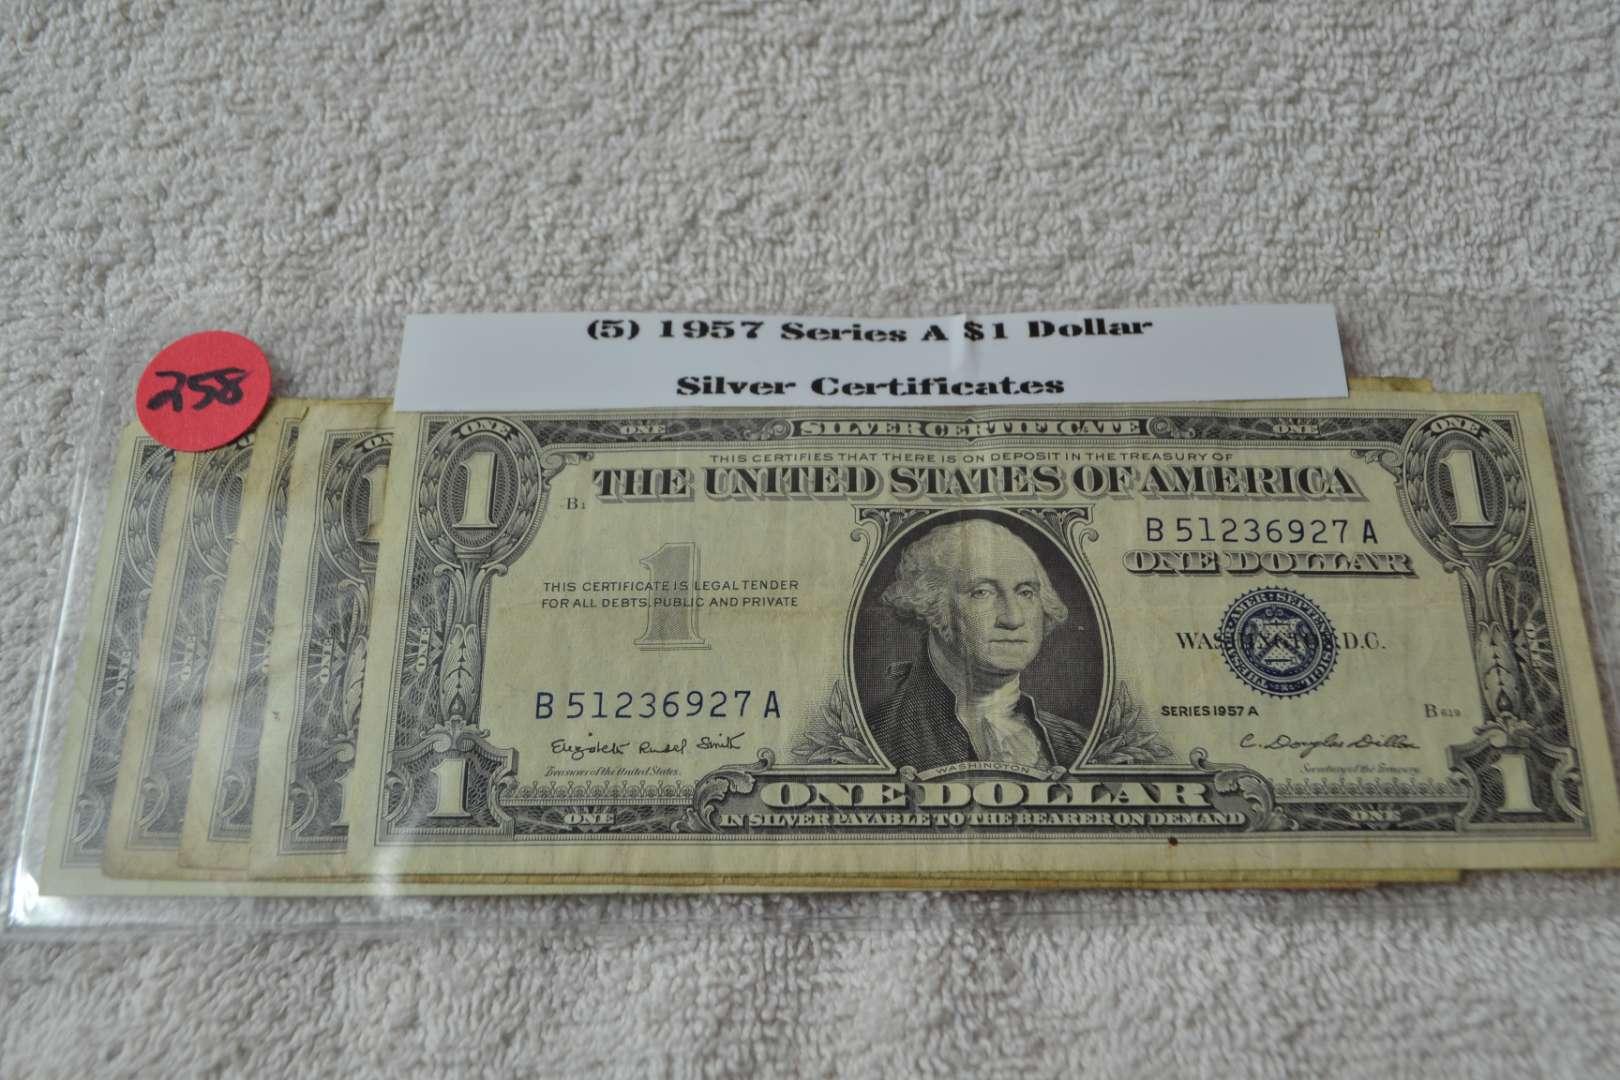 Lot # 258 FIVE 1957 SERIES A $1 SILVER CERTIFICATE